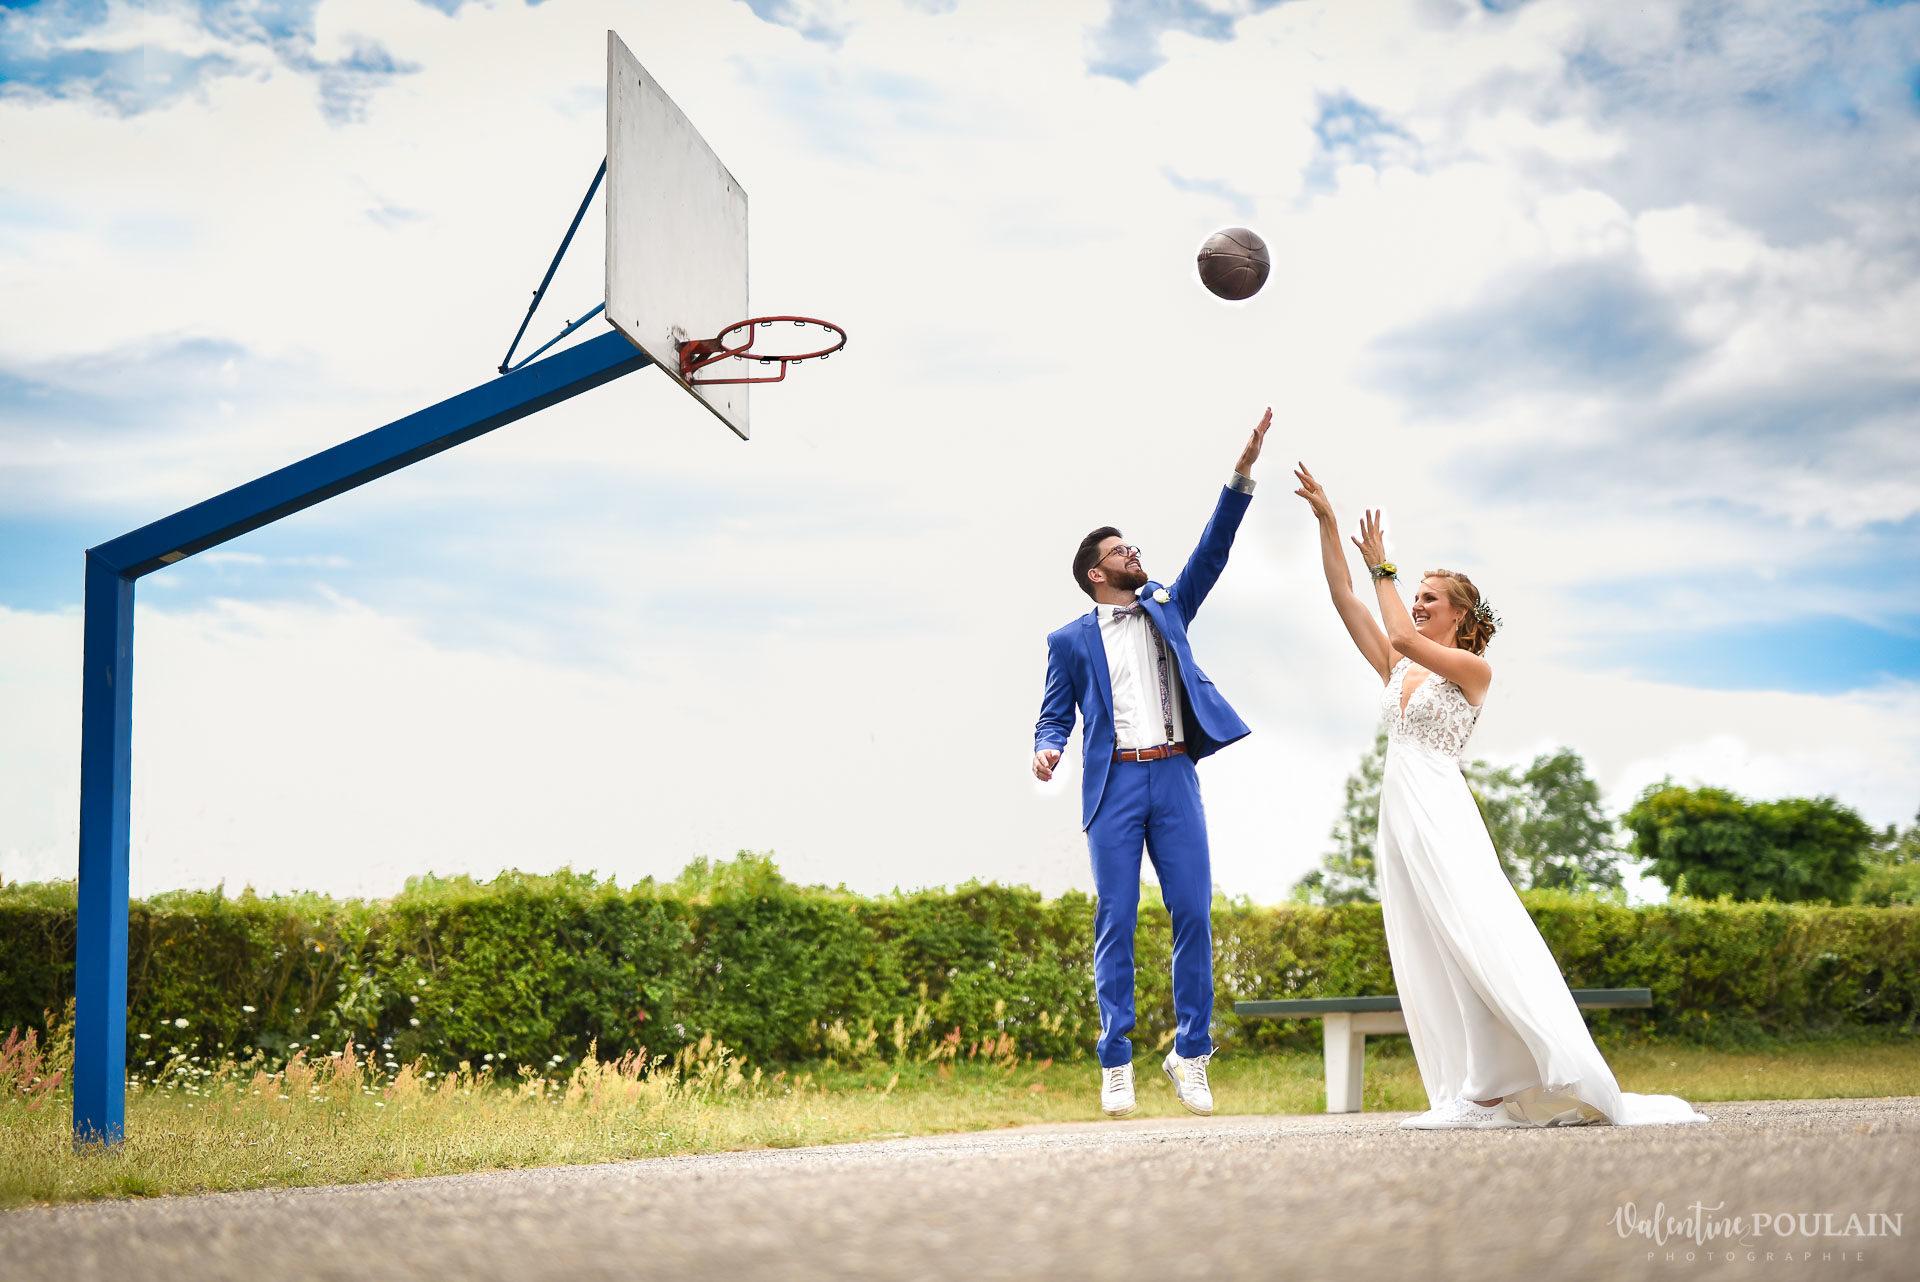 Mariage basket - Valentine Poulain